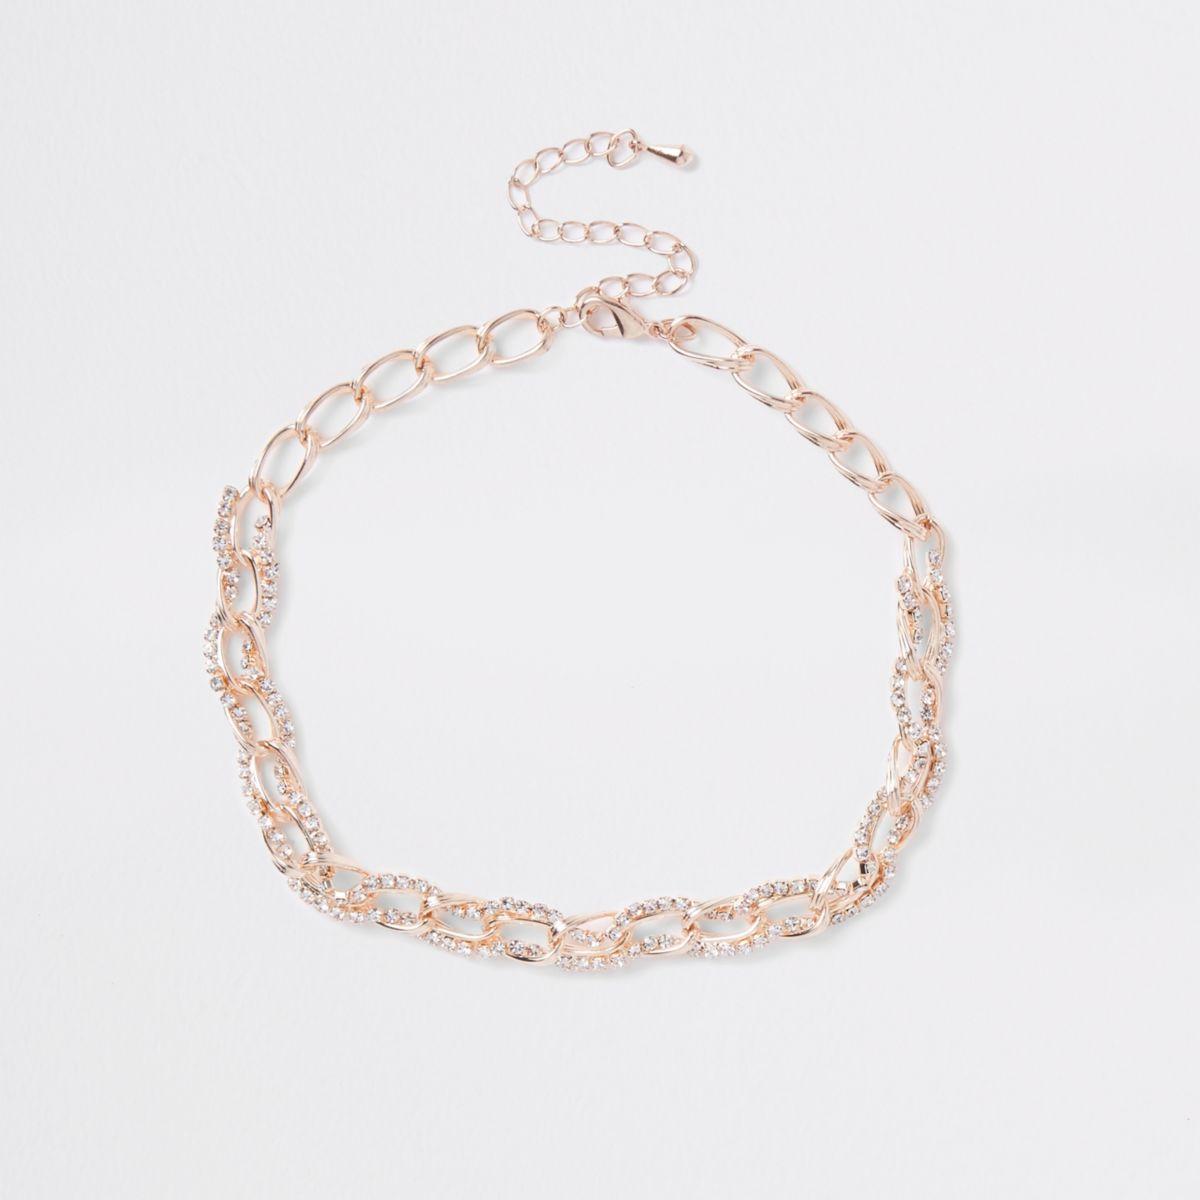 Rose gold diamante chain link choker